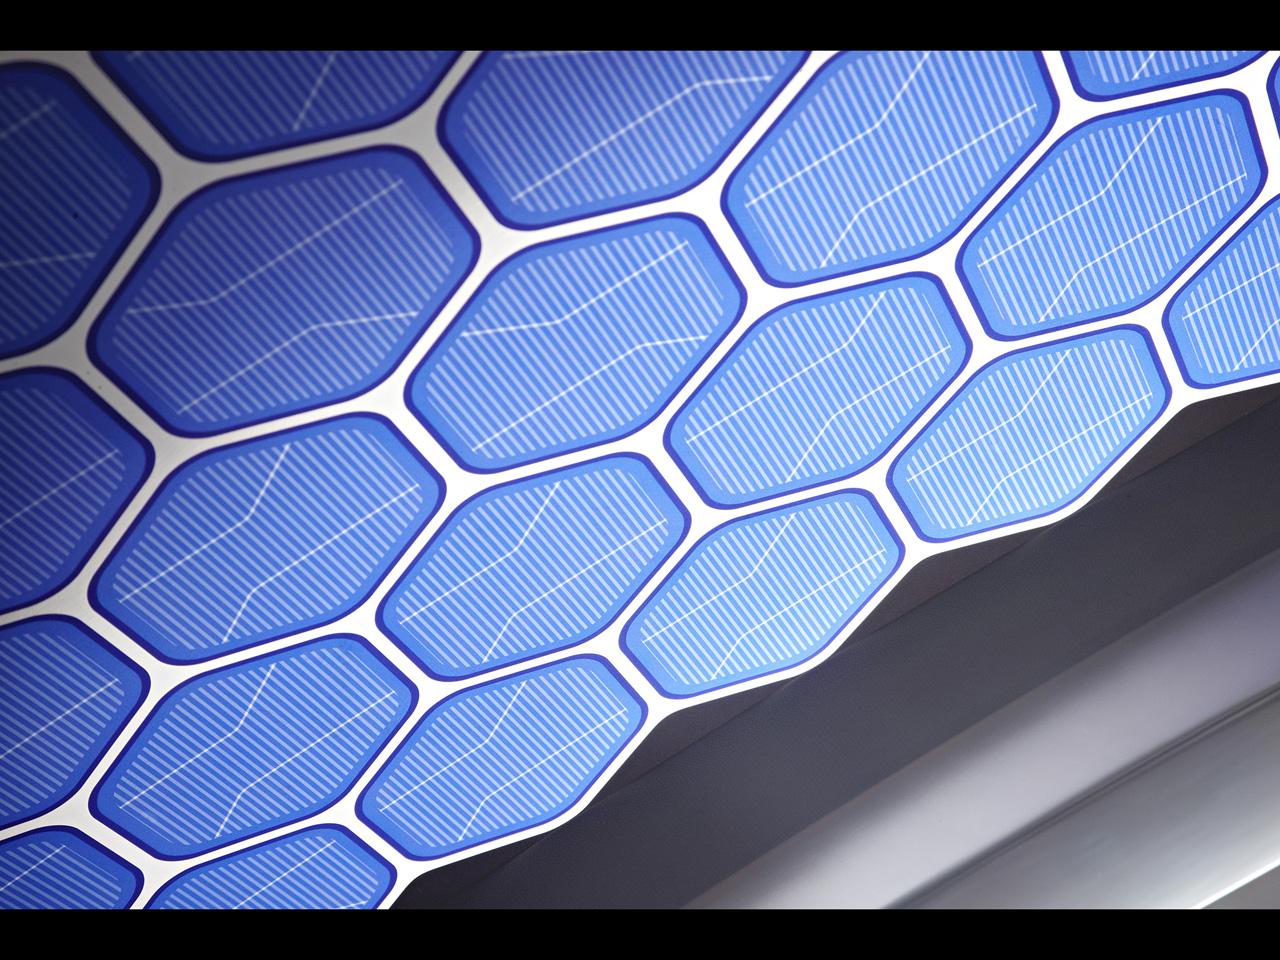 Land Rover DC100 Concept   Roof Solar Panels   1280x960   Wallpaper 1280x960